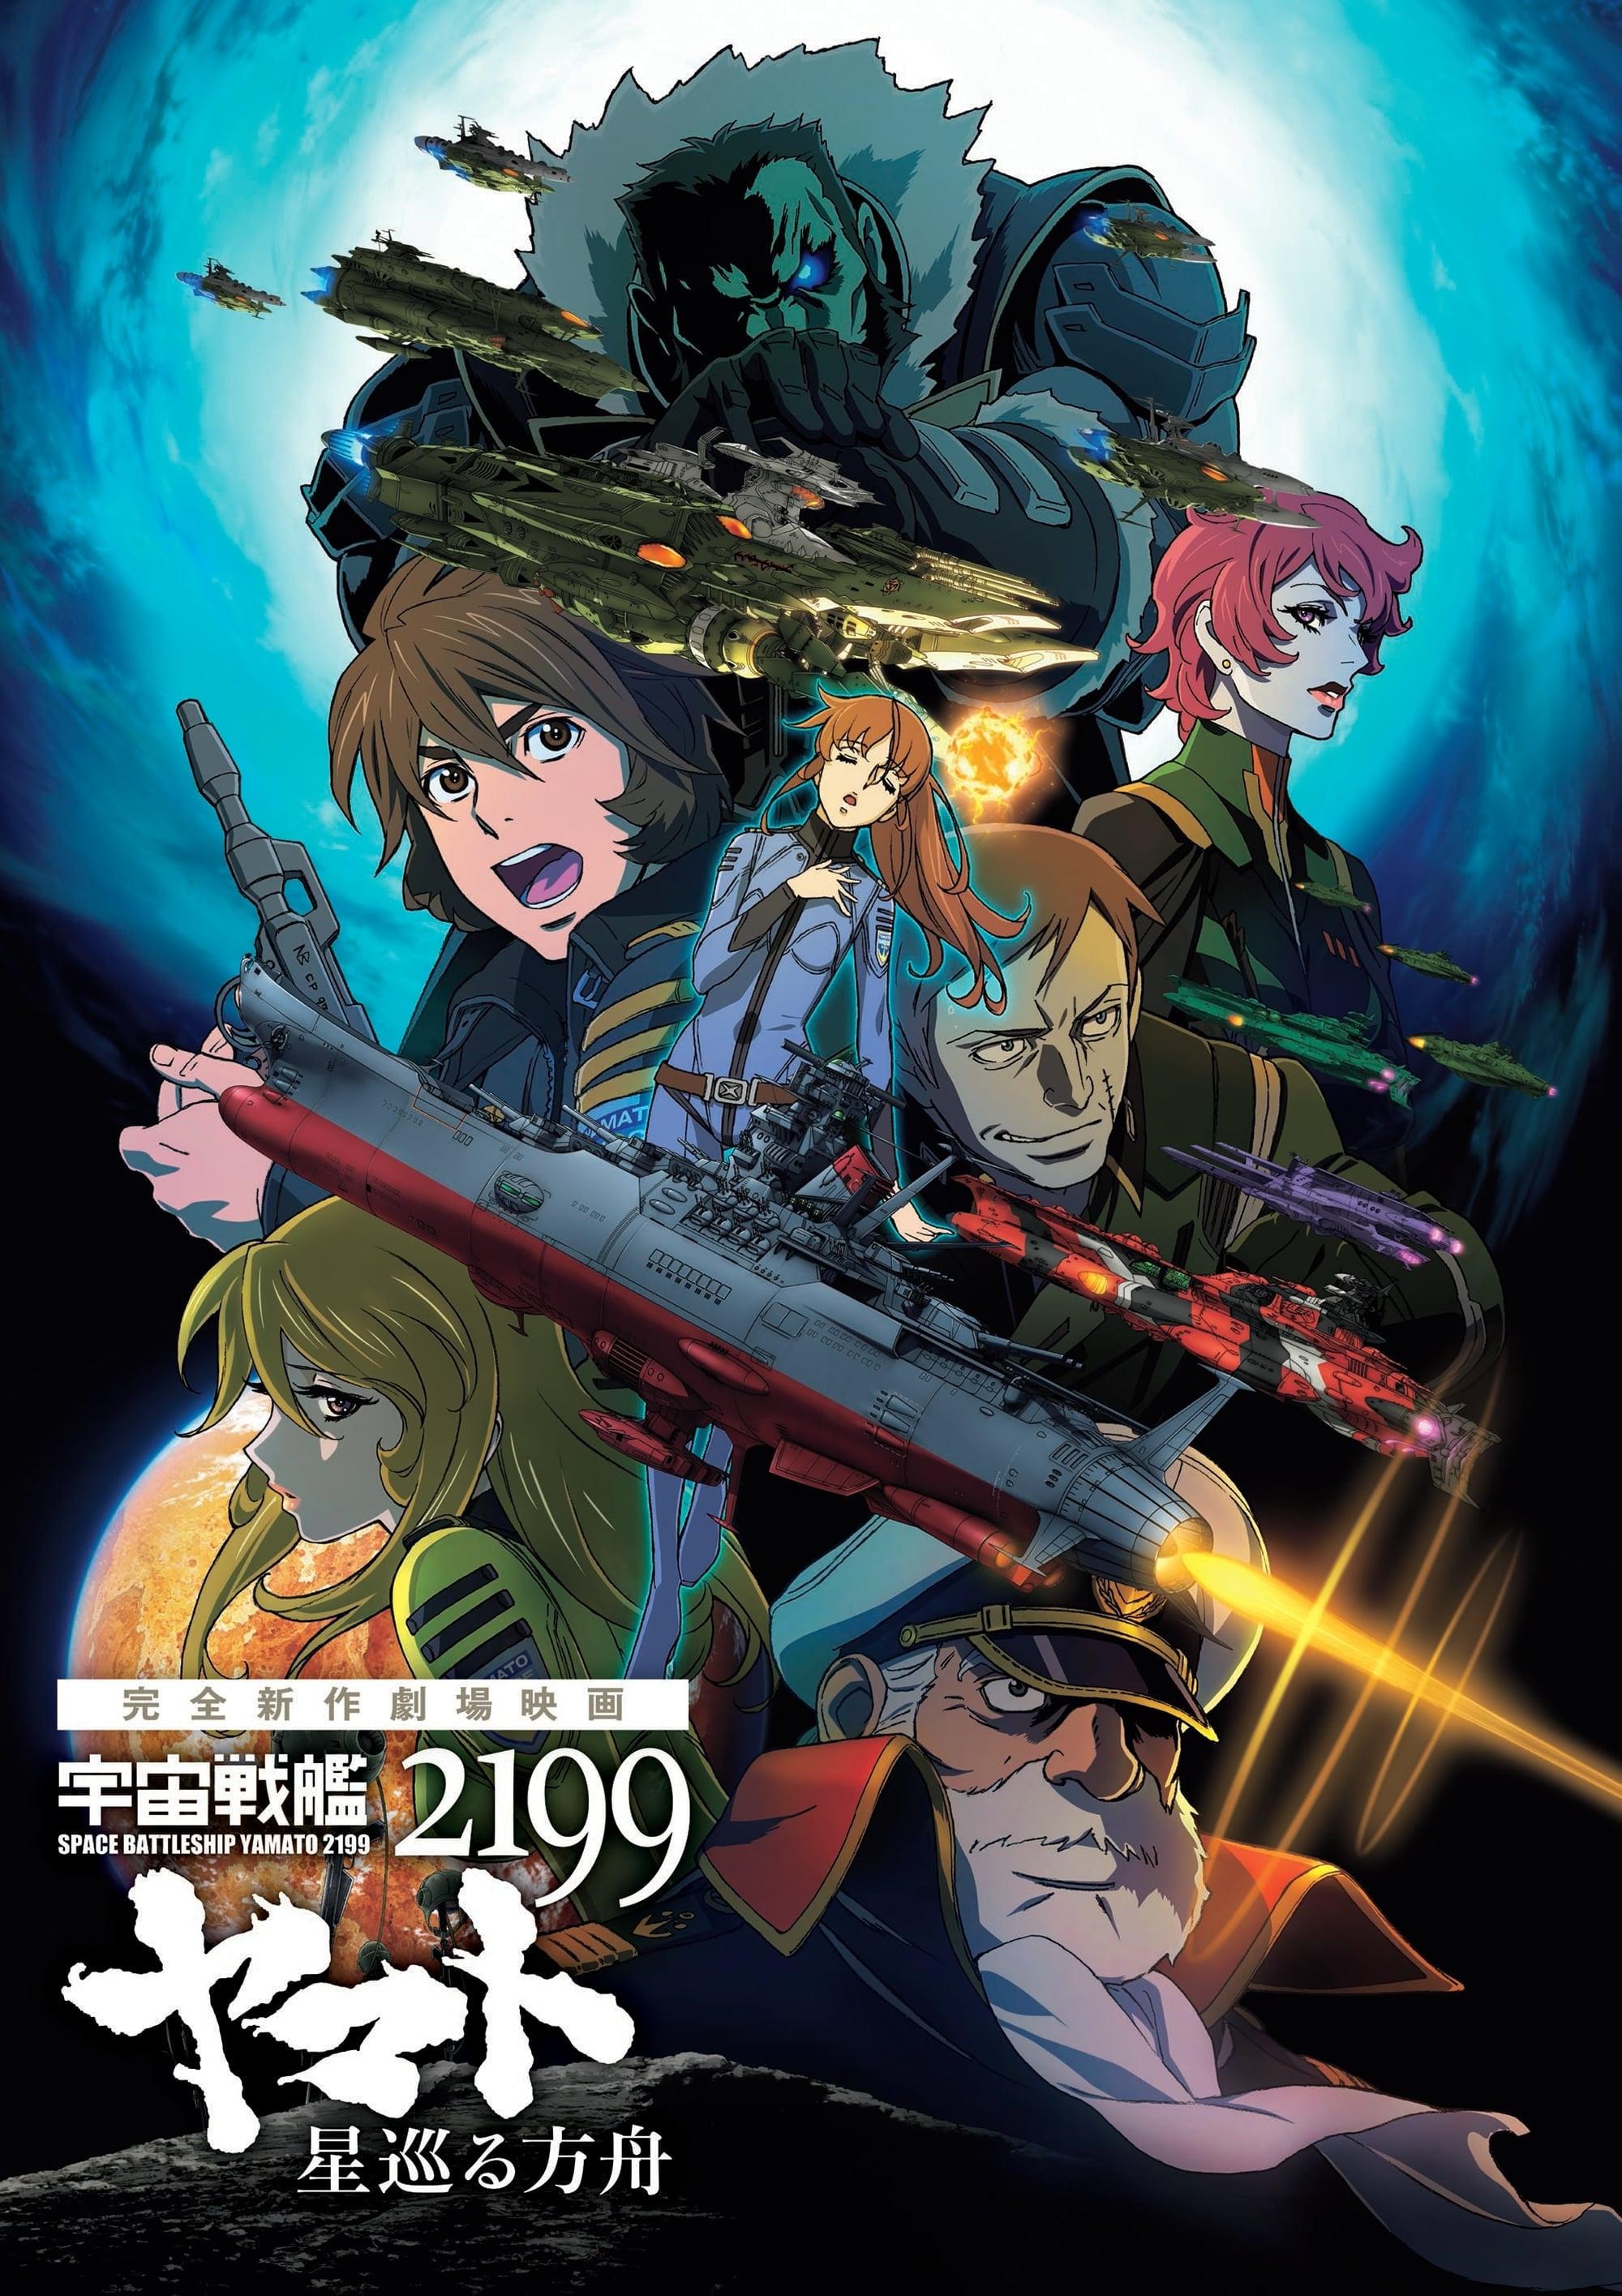 Space Battleship Yamato 2199: Odyssey of the Celestial Ark